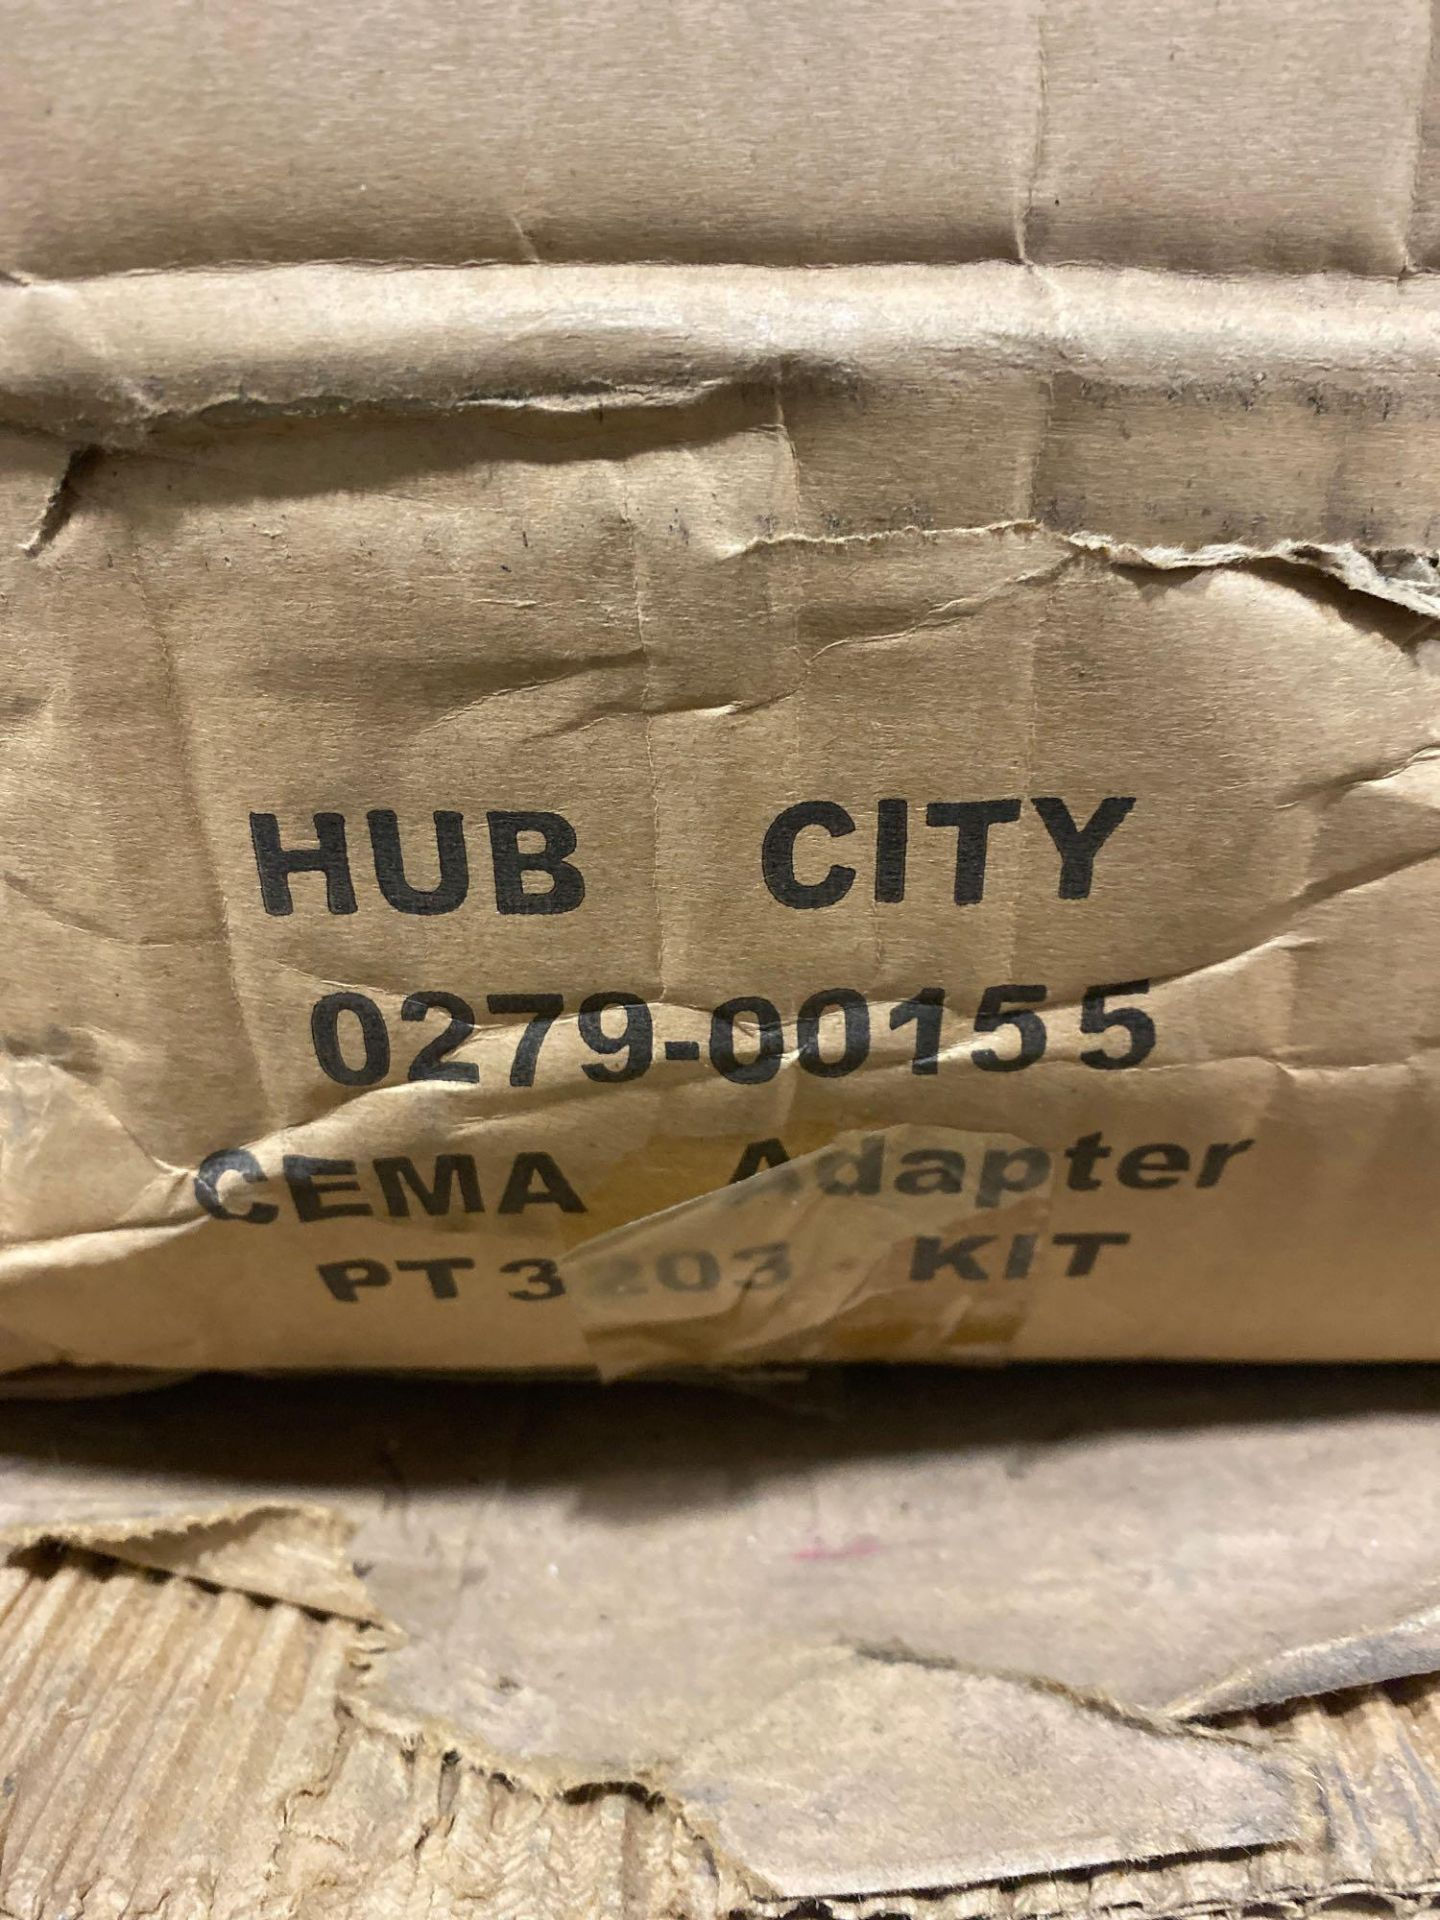 Lot 8 - Hub City model 0279-00155 adapter kit. New in box.